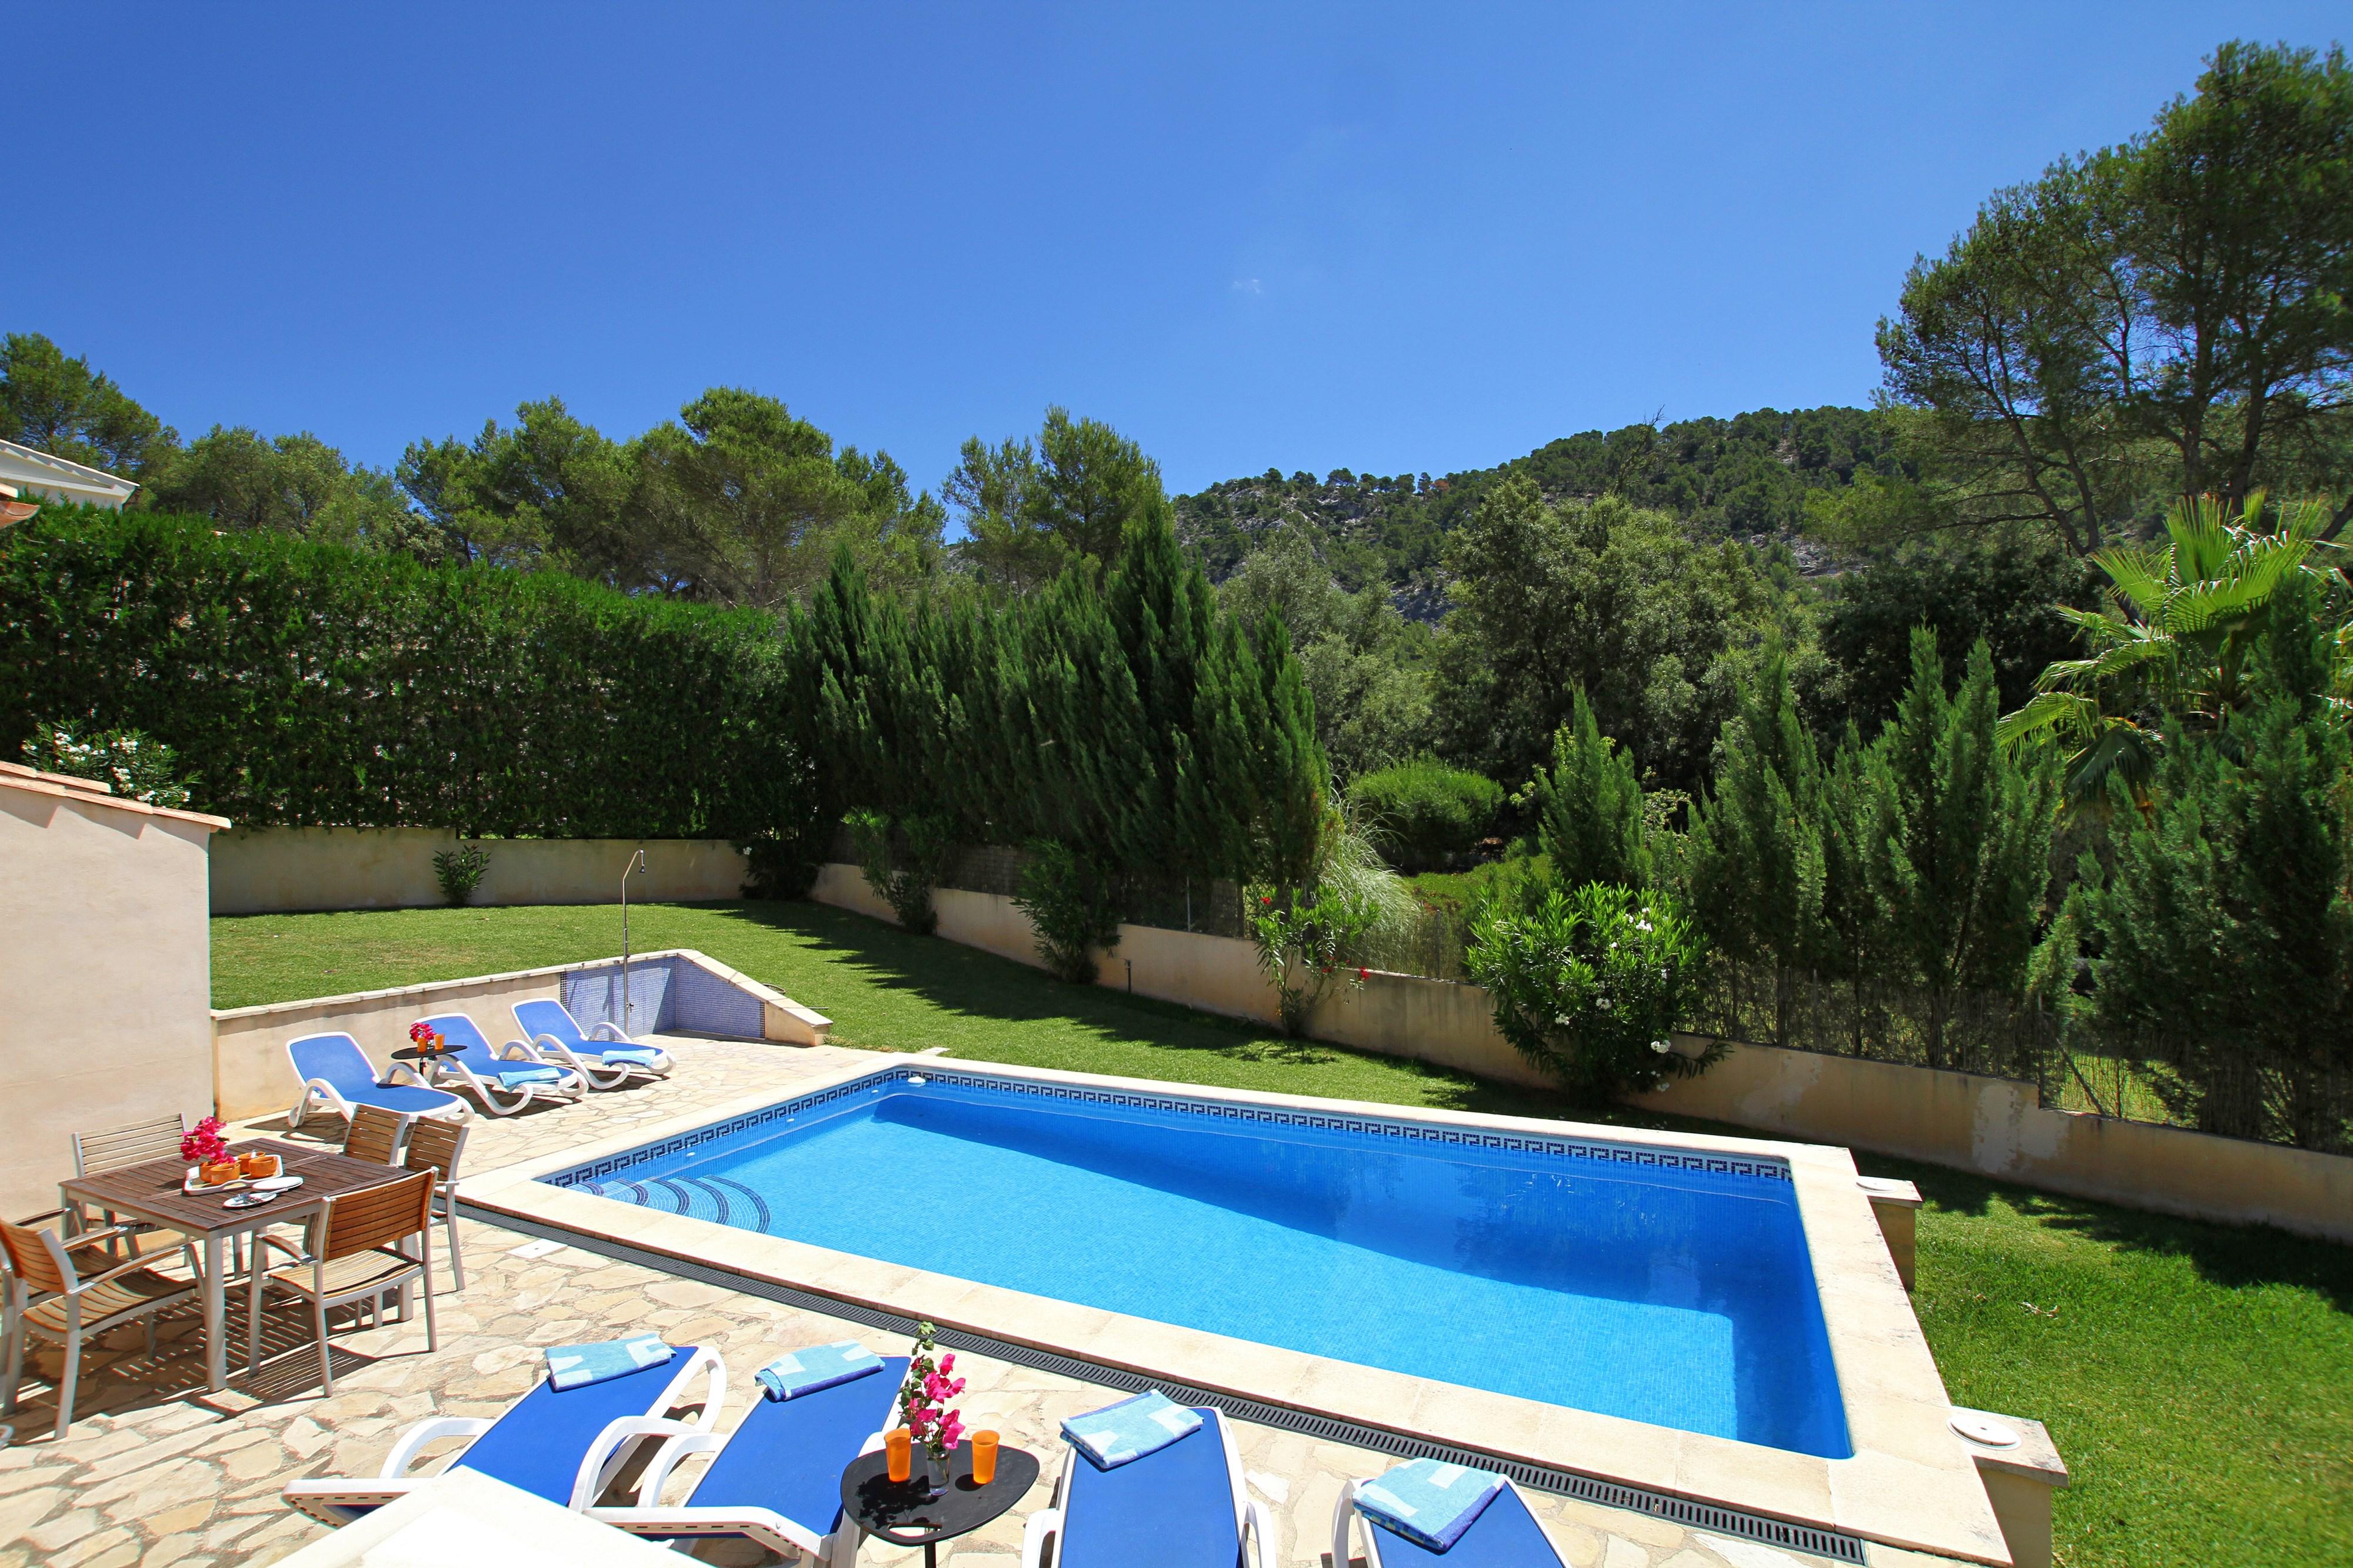 Can Rueda is a holiday Villa in Pollensa, Mallorca (Spain